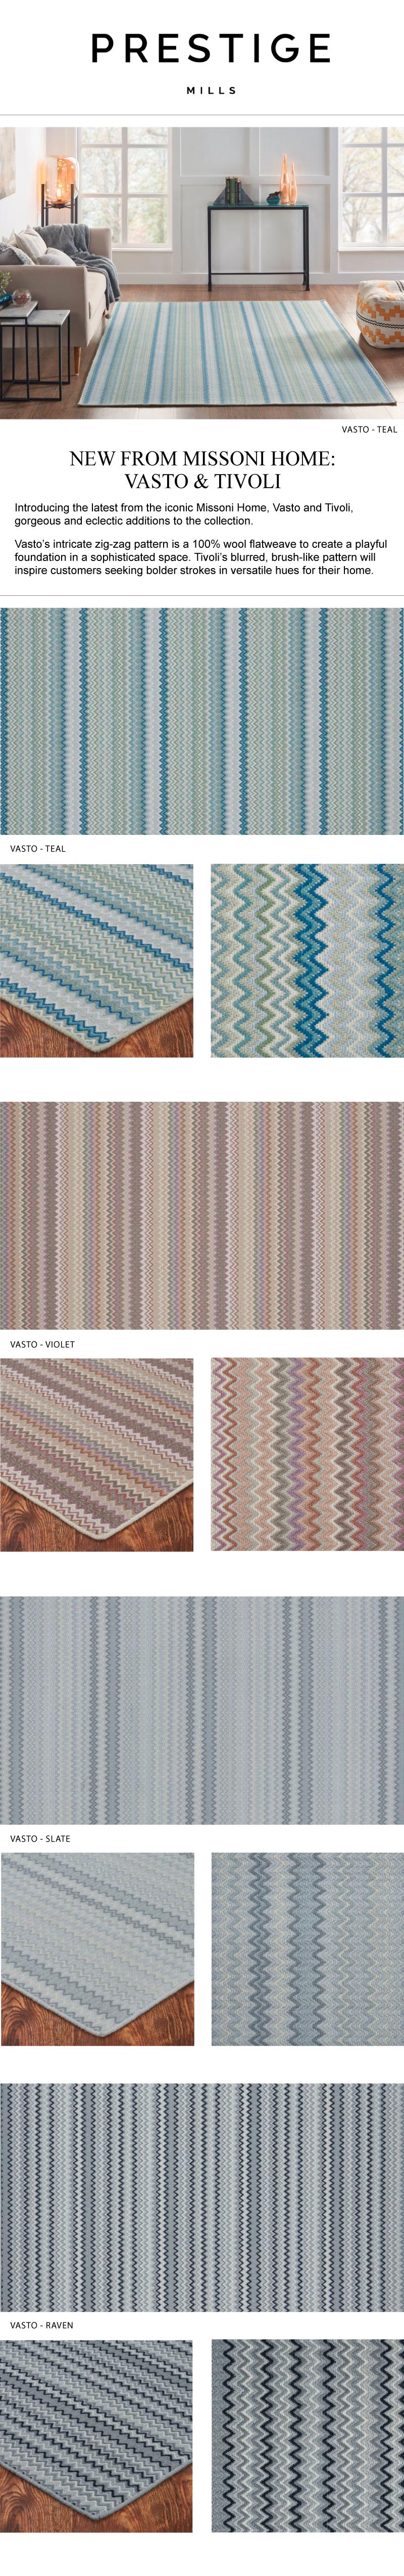 071921-Prestige Mills   NEW Missoni Home: Tivoli & Vasto images 1